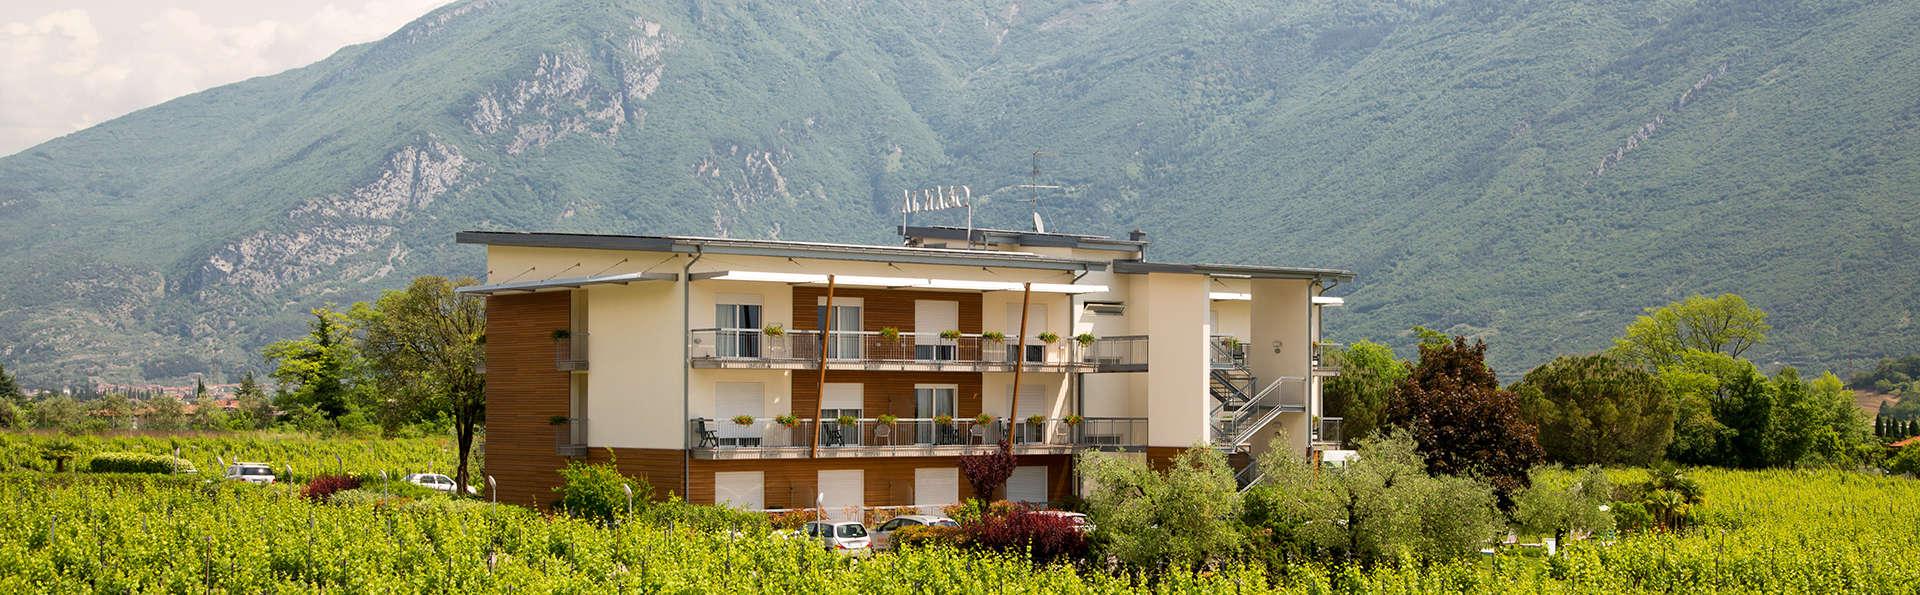 Hotel Al Maso - edit_Facciata.jpg